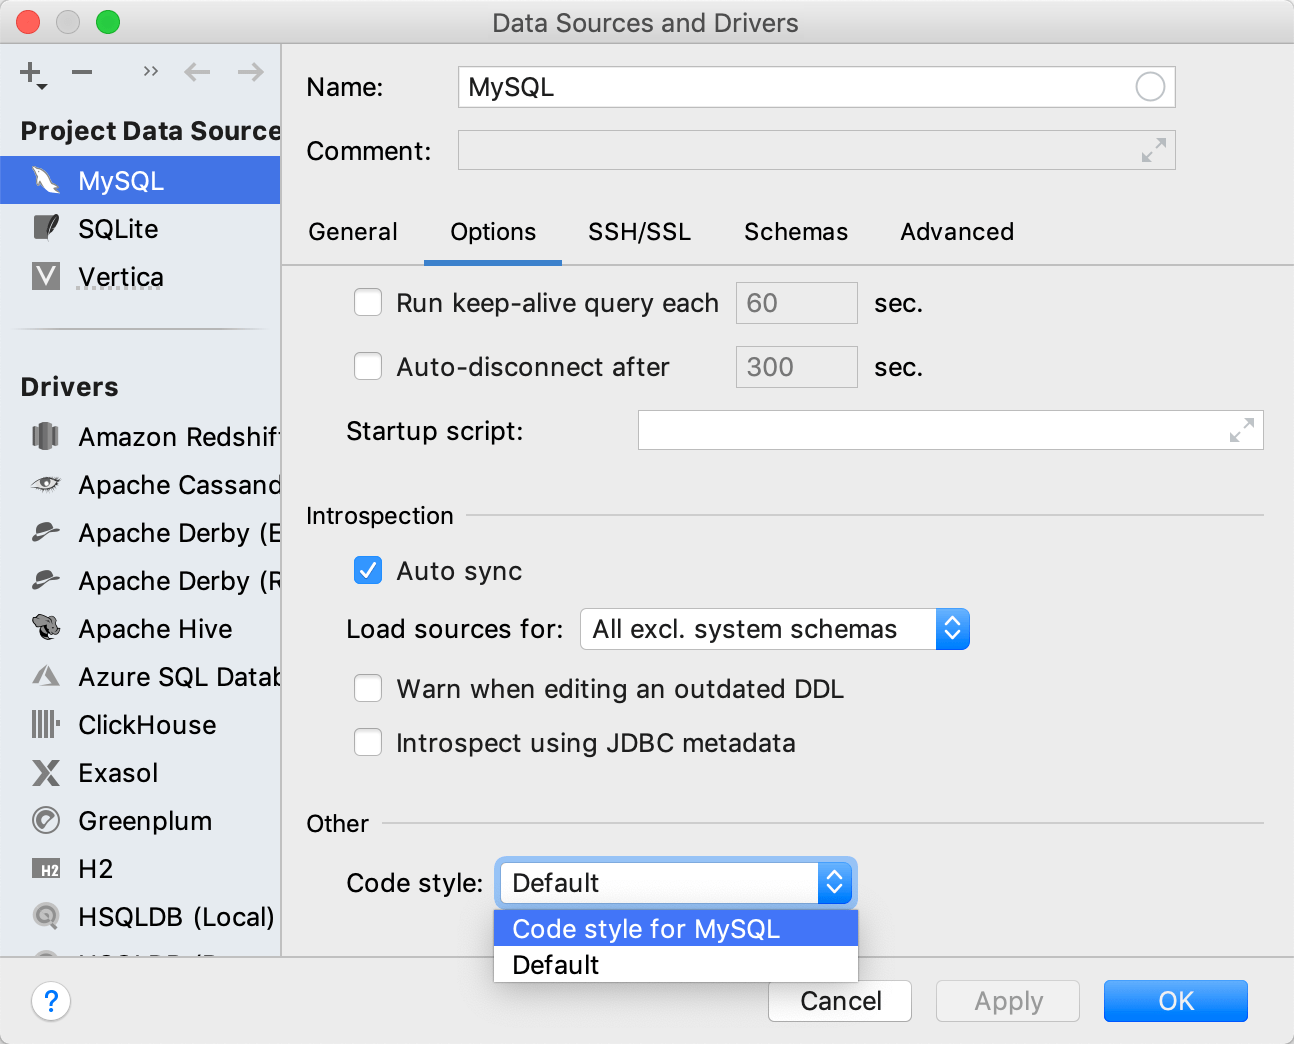 Configure code styles per data source